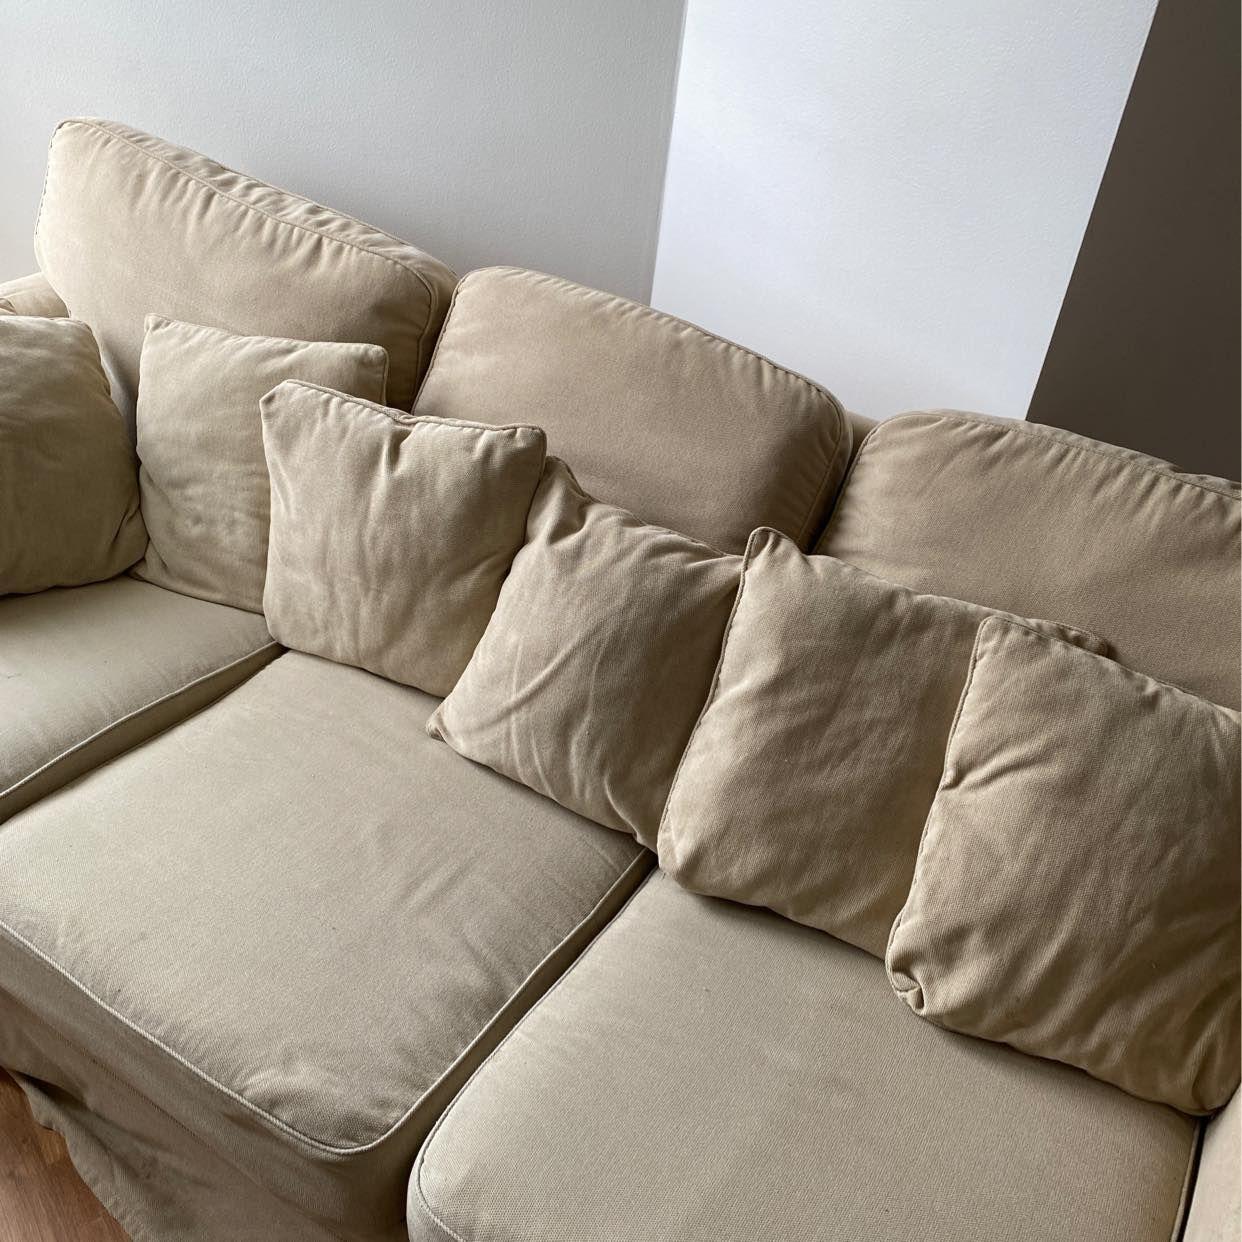 image of Remove a big sofa - Örebro